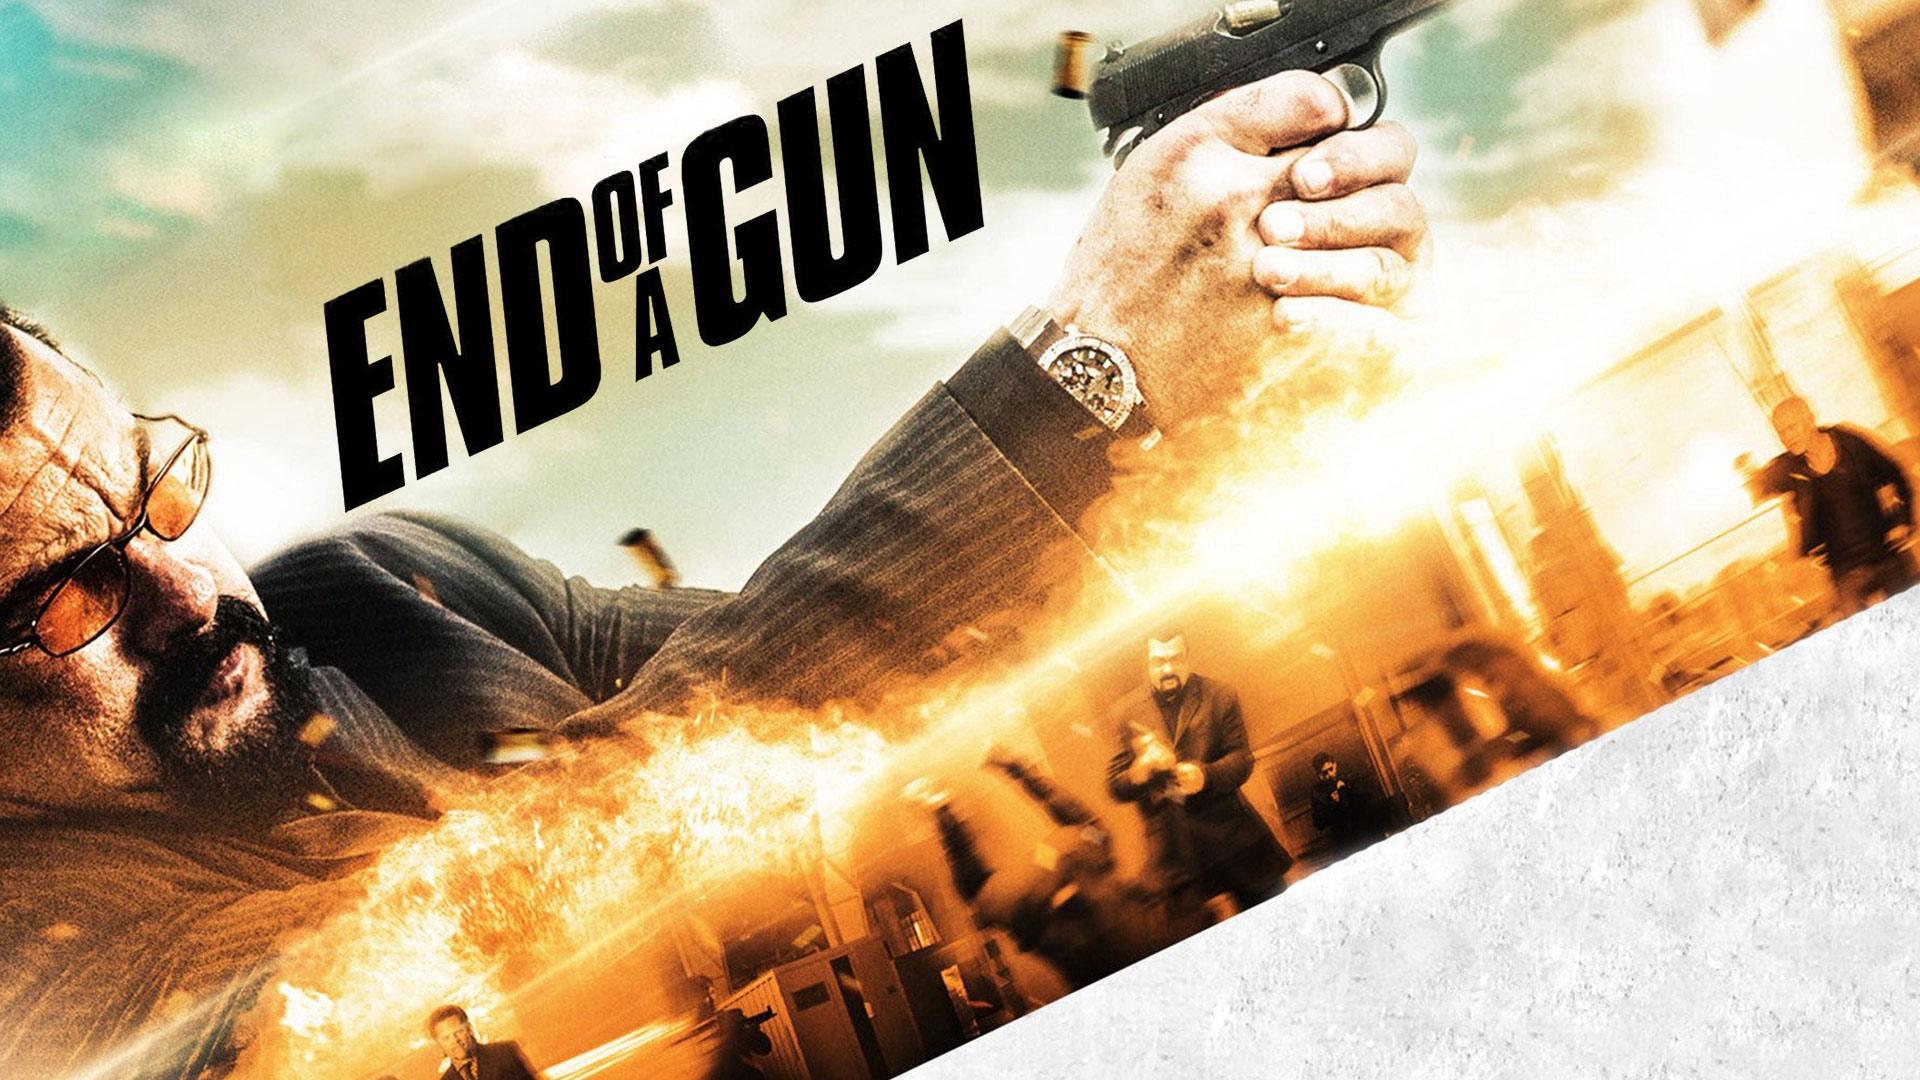 End of a Gun